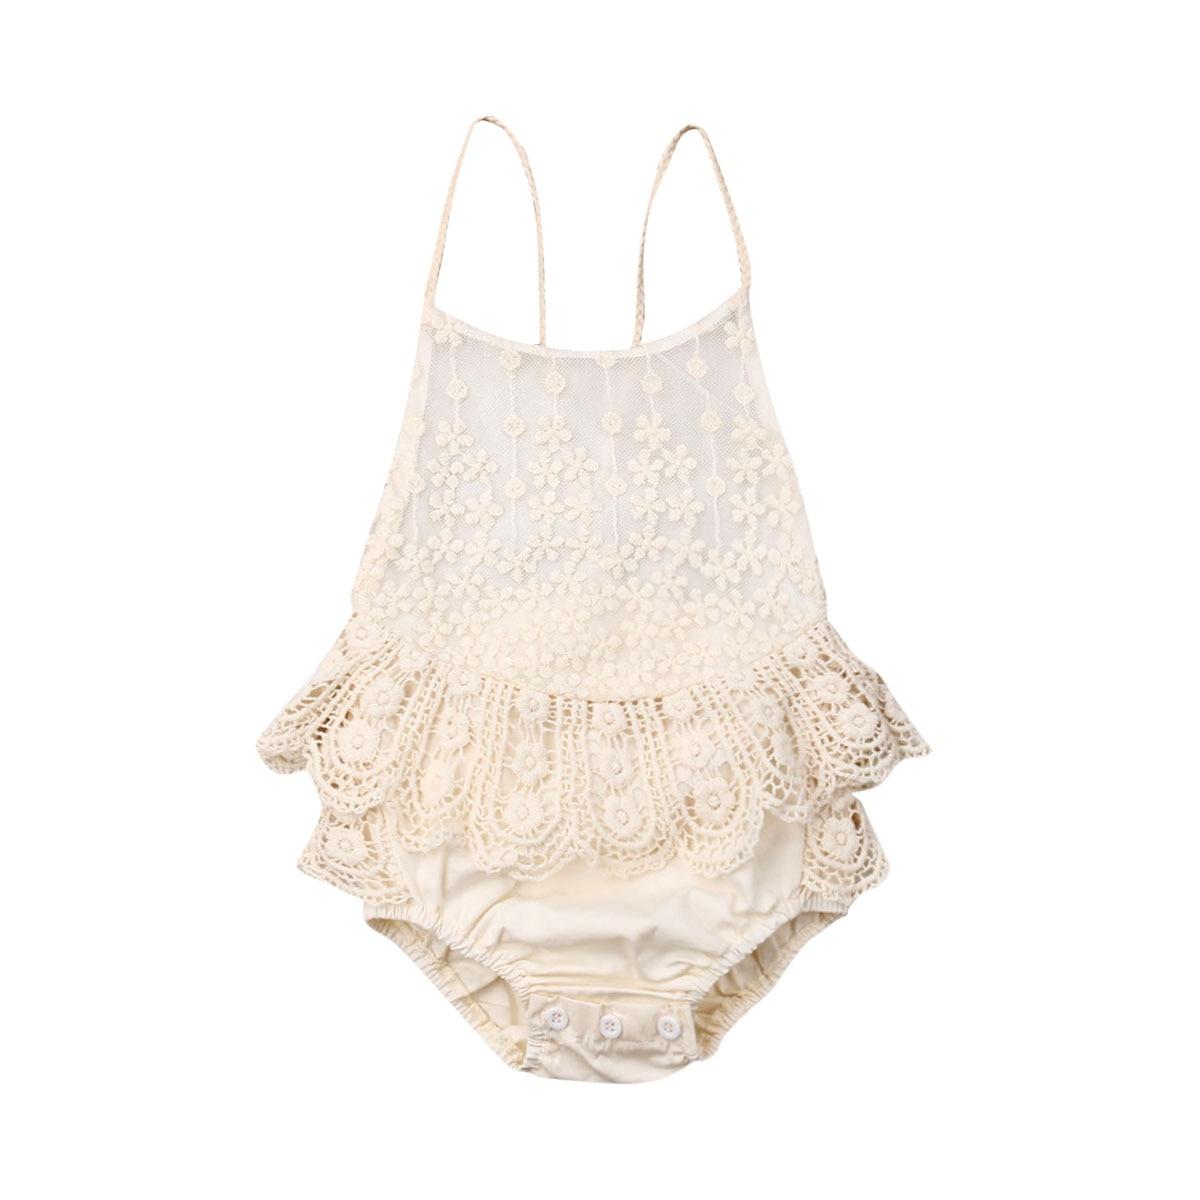 2020 Baby Summer Clothing 0-12M Cute Baby Girl Lace Bandage Bodysuits Sleeveless Ruffle Jumpsuit Cas